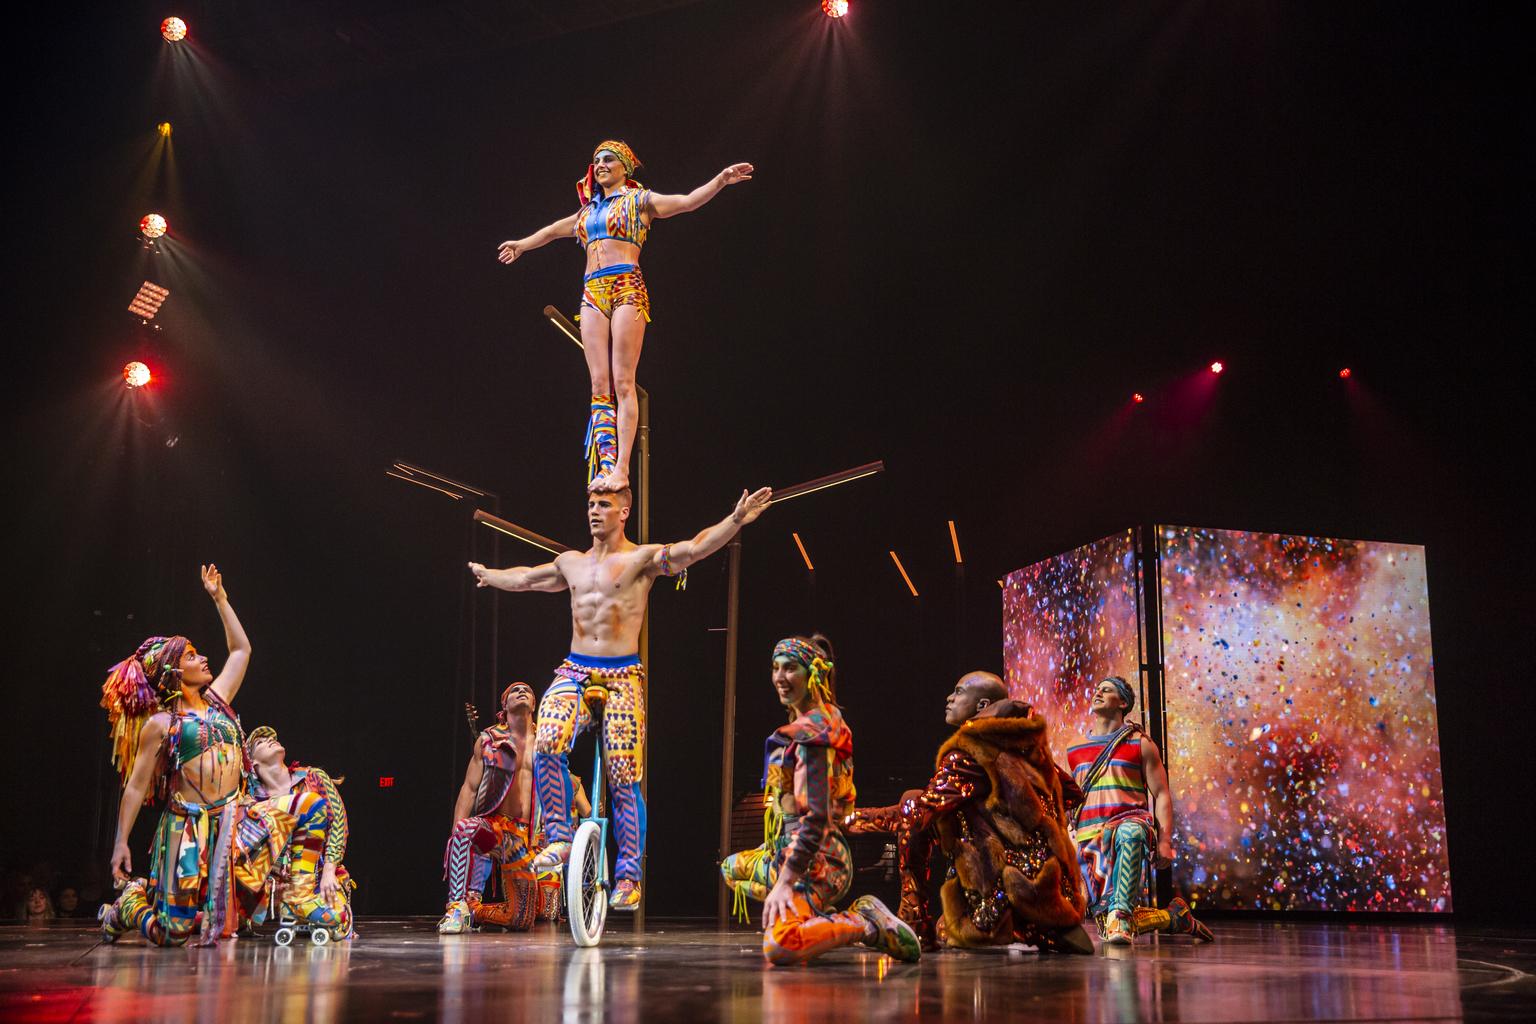 Cirque du Soleil, VOLTA